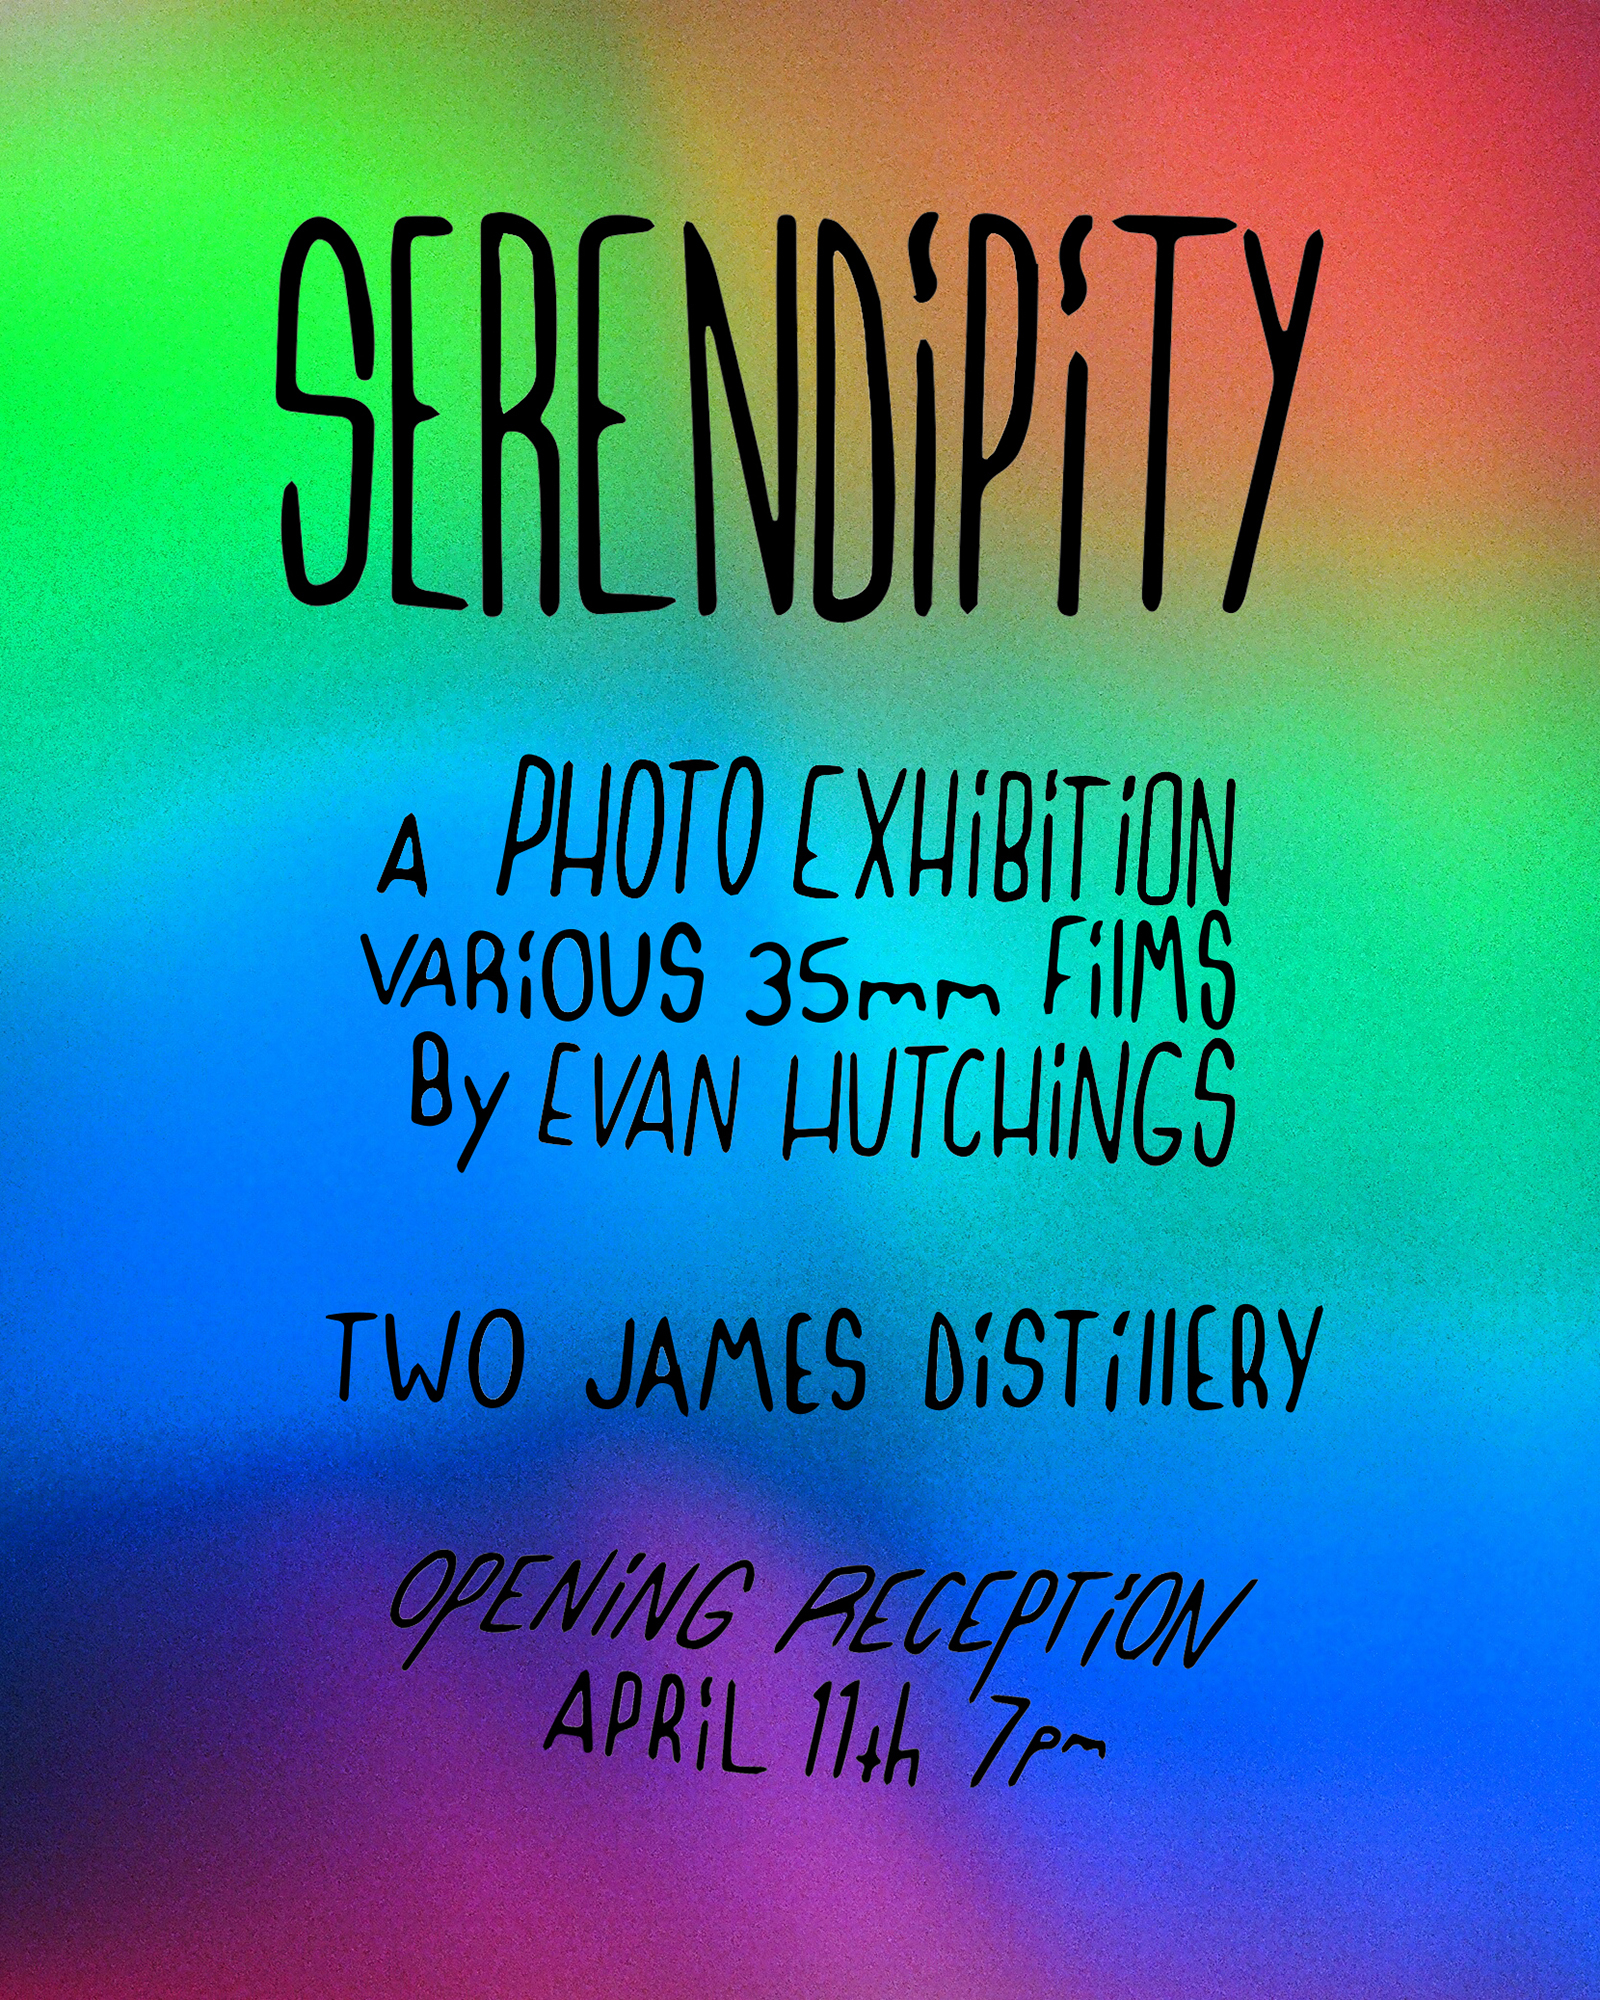 serendipityflyer-3finalWEB.jpg